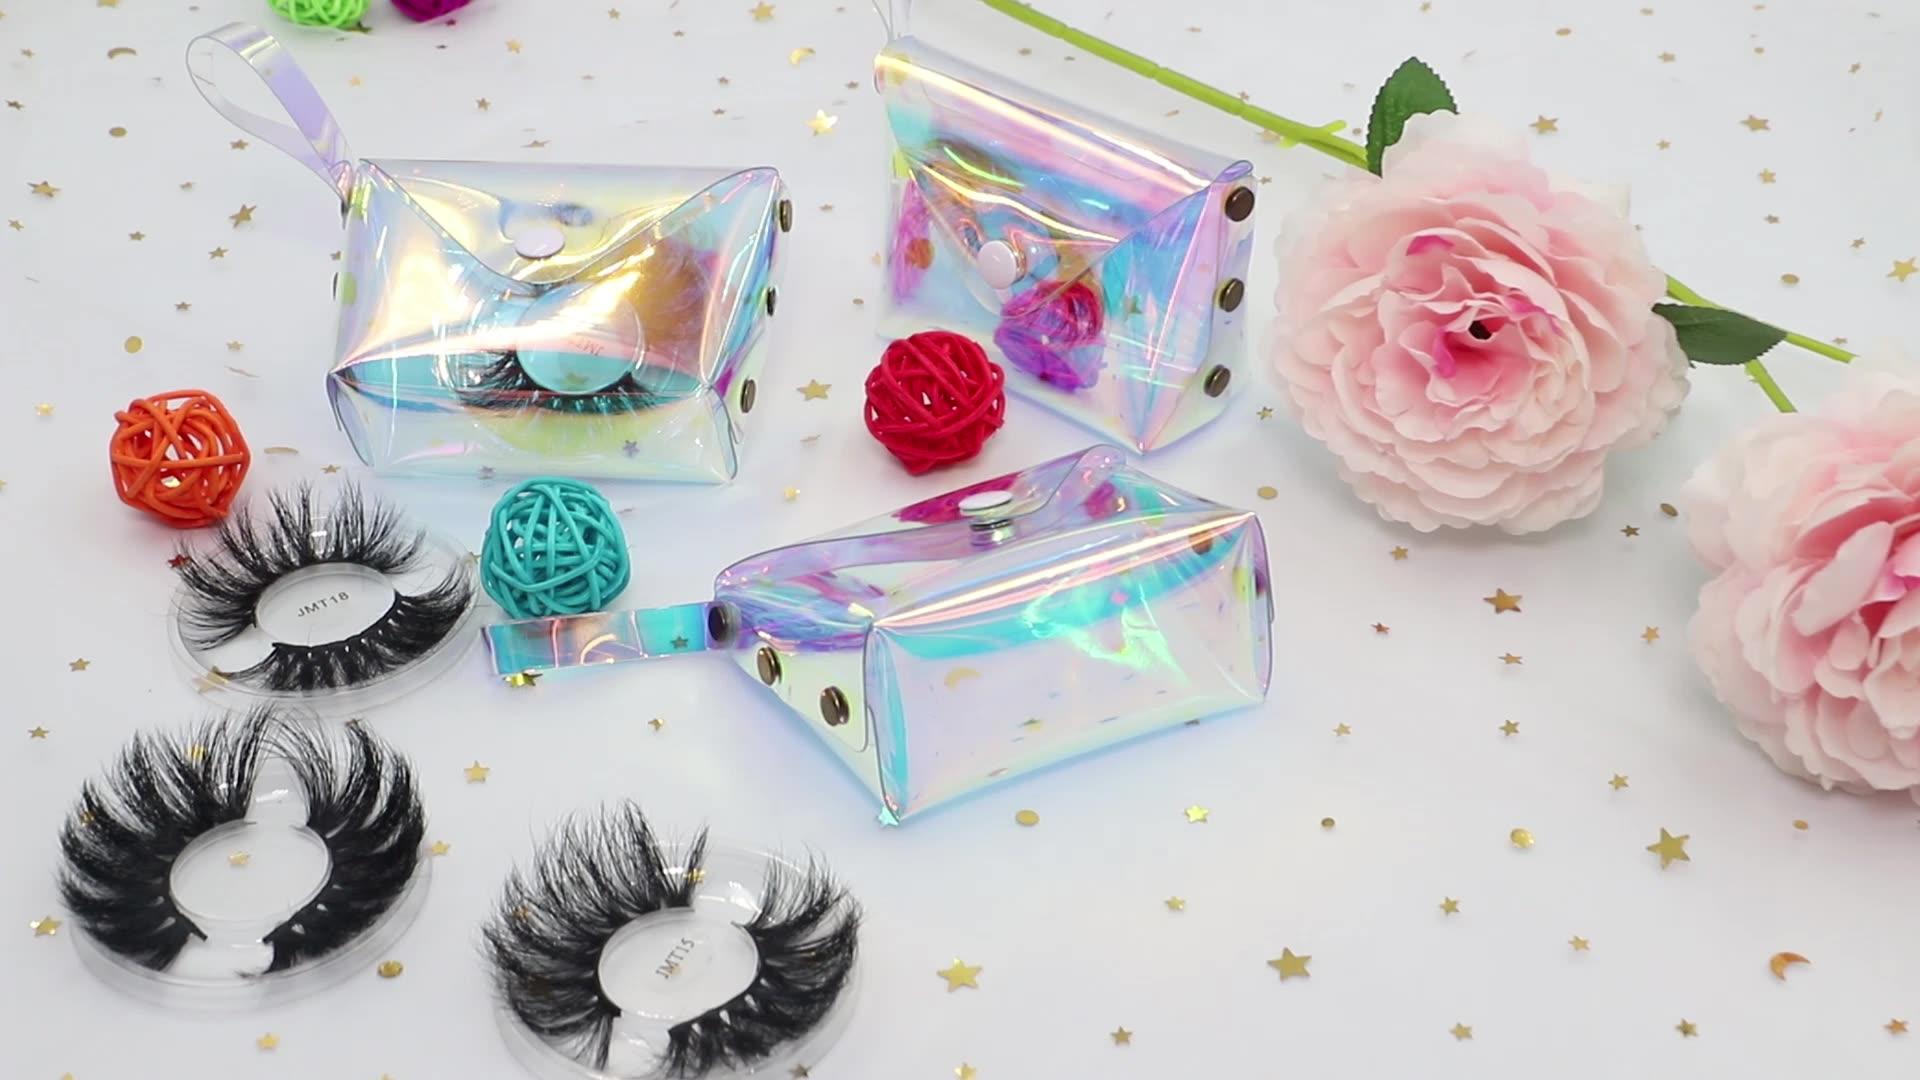 Wholesale Mink Eyelashes Vendor 3D Mink Lashes  Private Label Dramatic 5D 25mm Mink Eyelashes With Custom Eyelash Packaging Box